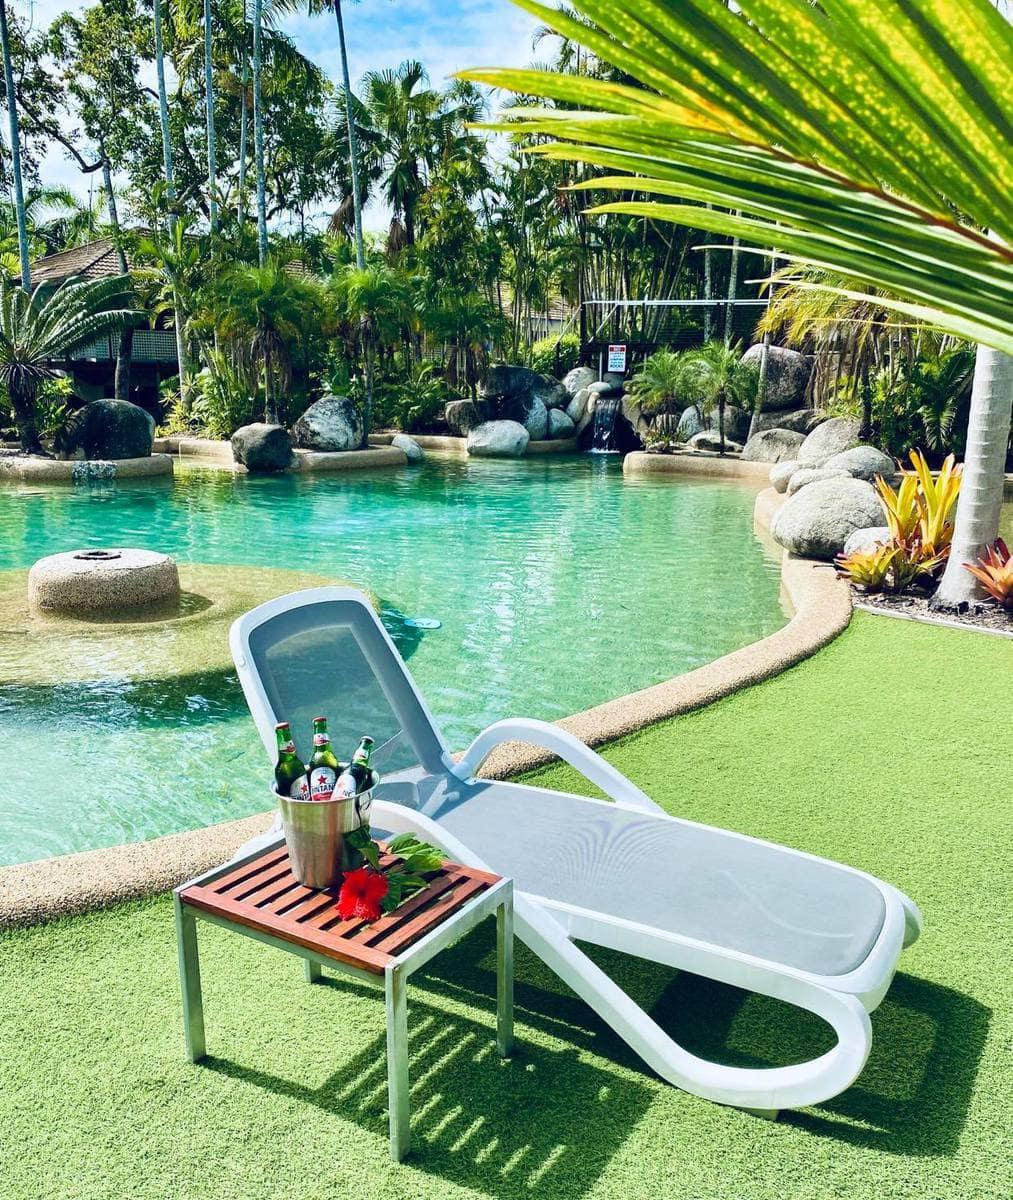 rachel's pool bar & restaurant